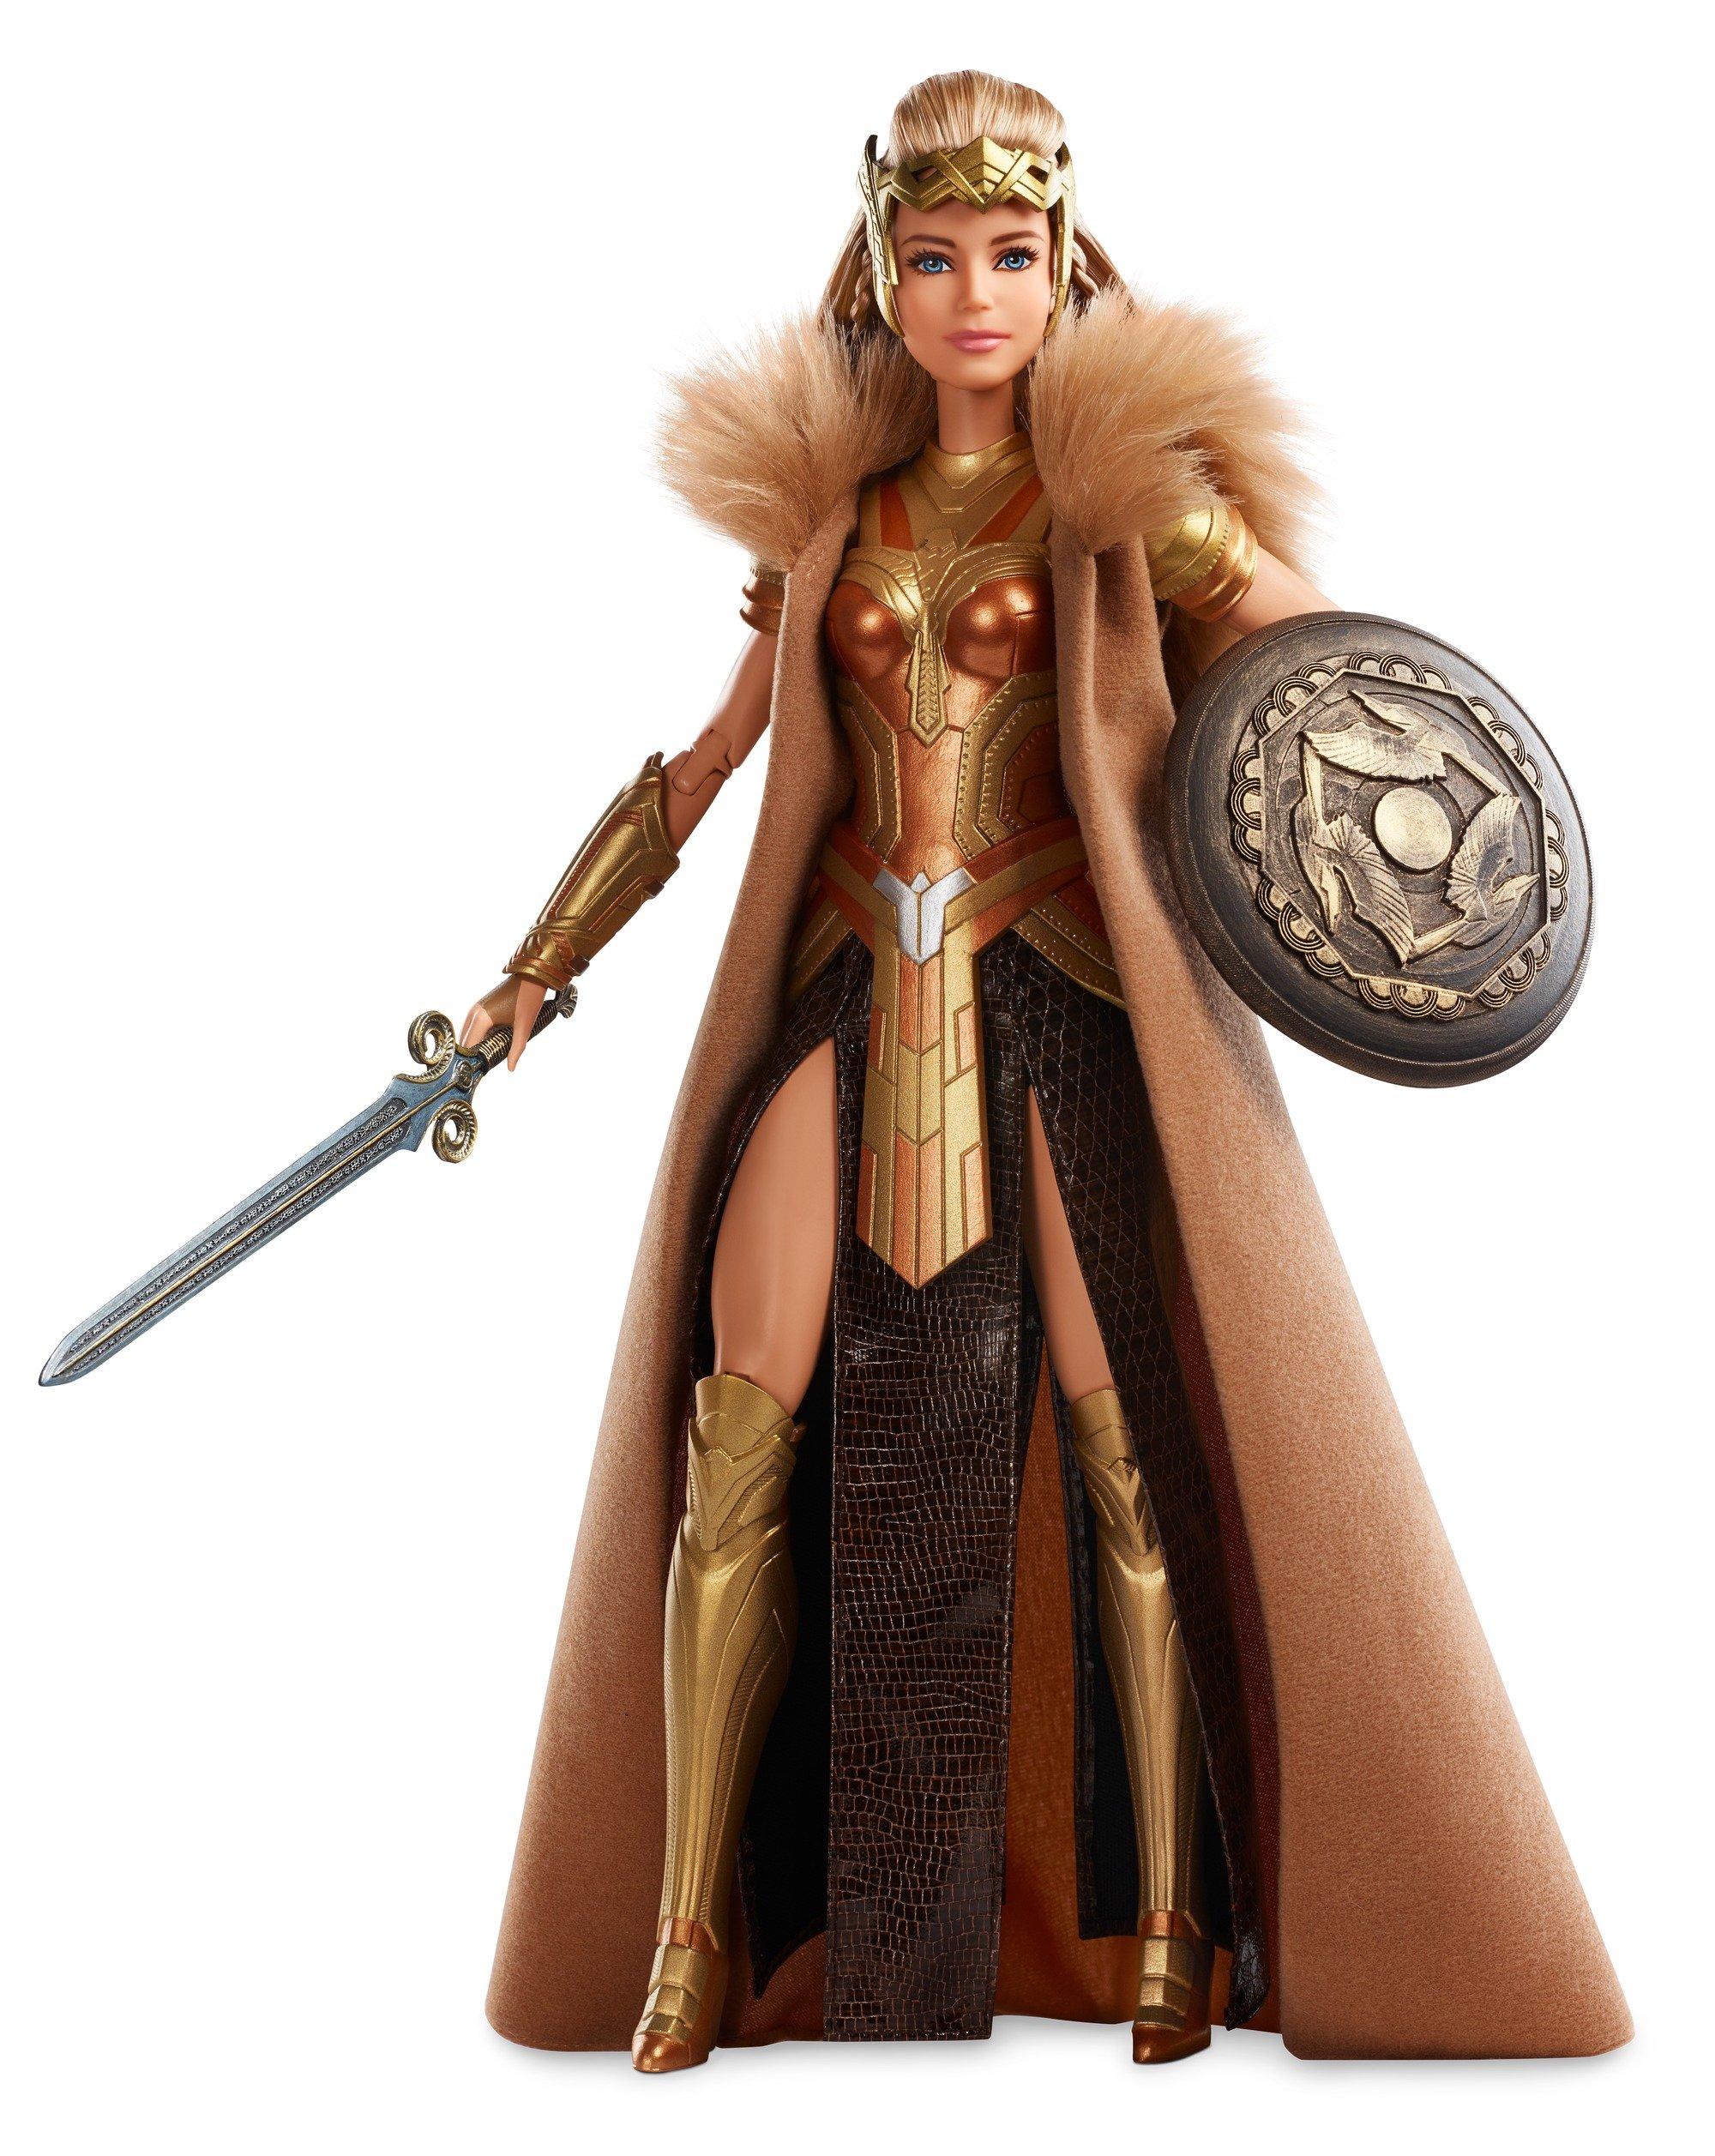 Barbie Hippolyta Doll